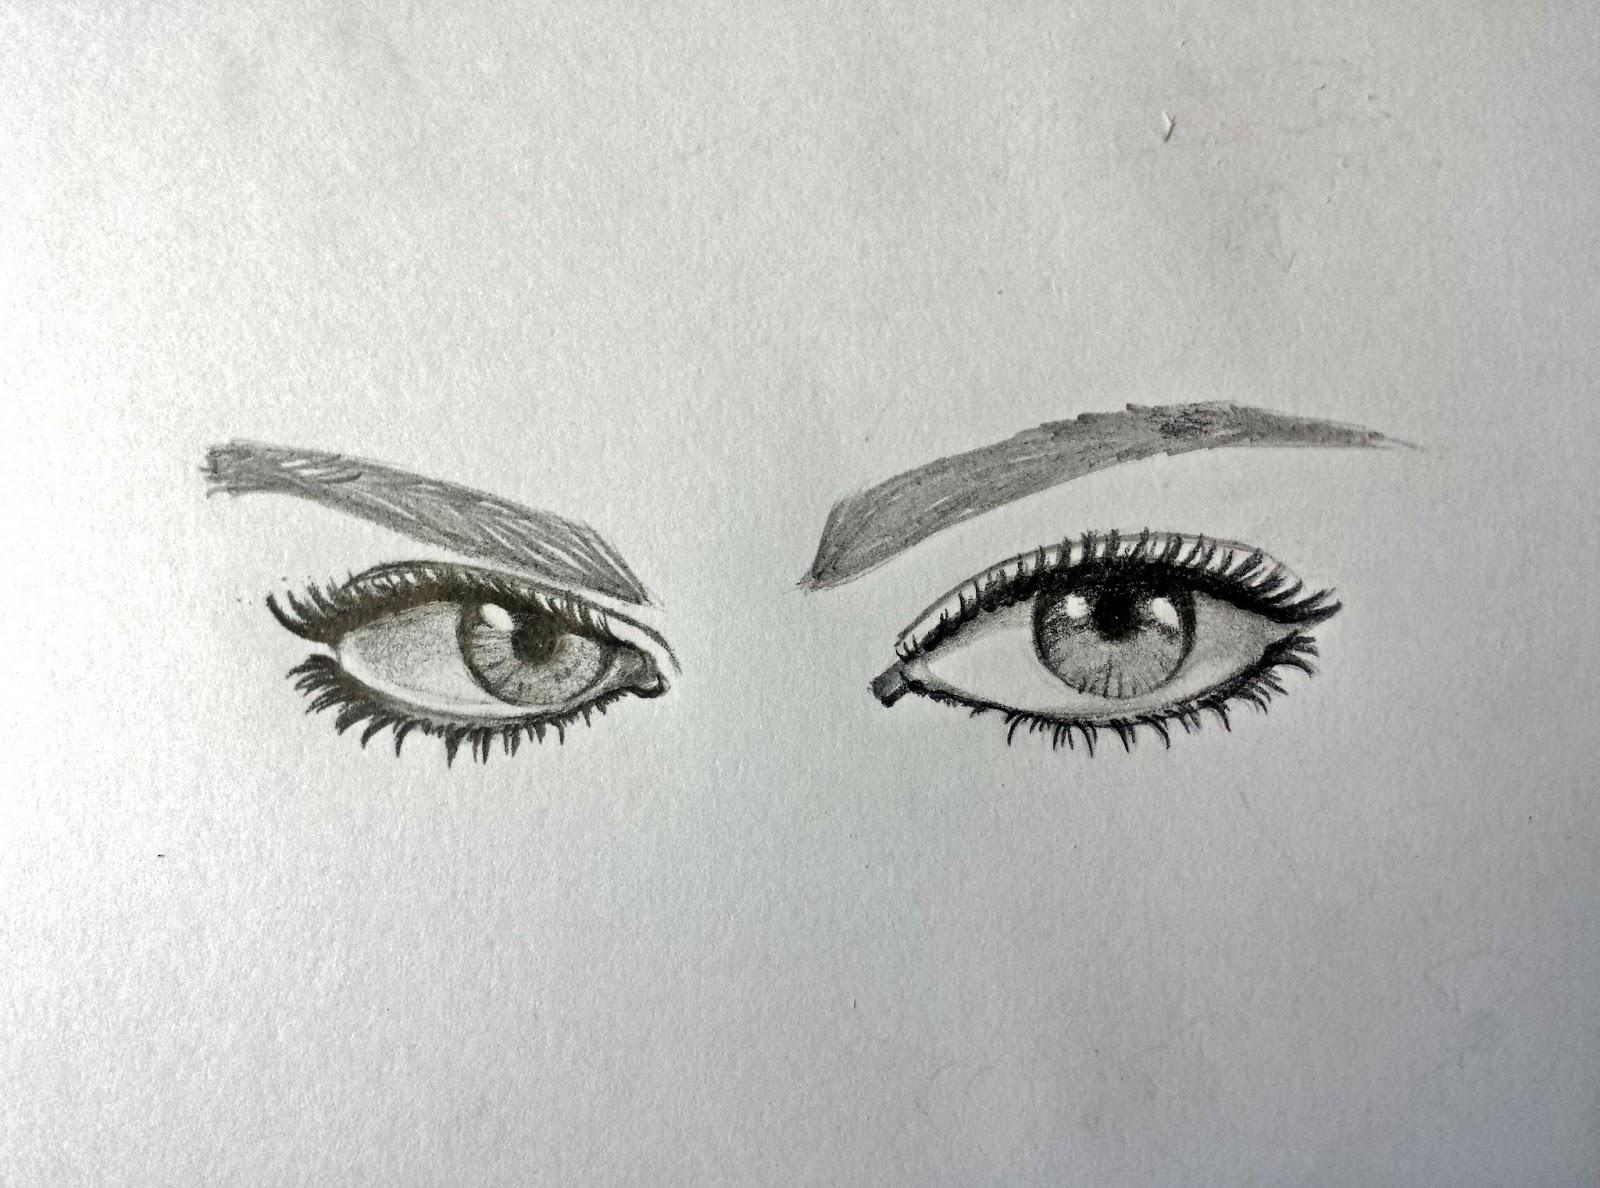 Dibujos De Ojos Llorando A Lapiz Ojos Llorando Dibujo Fondos De